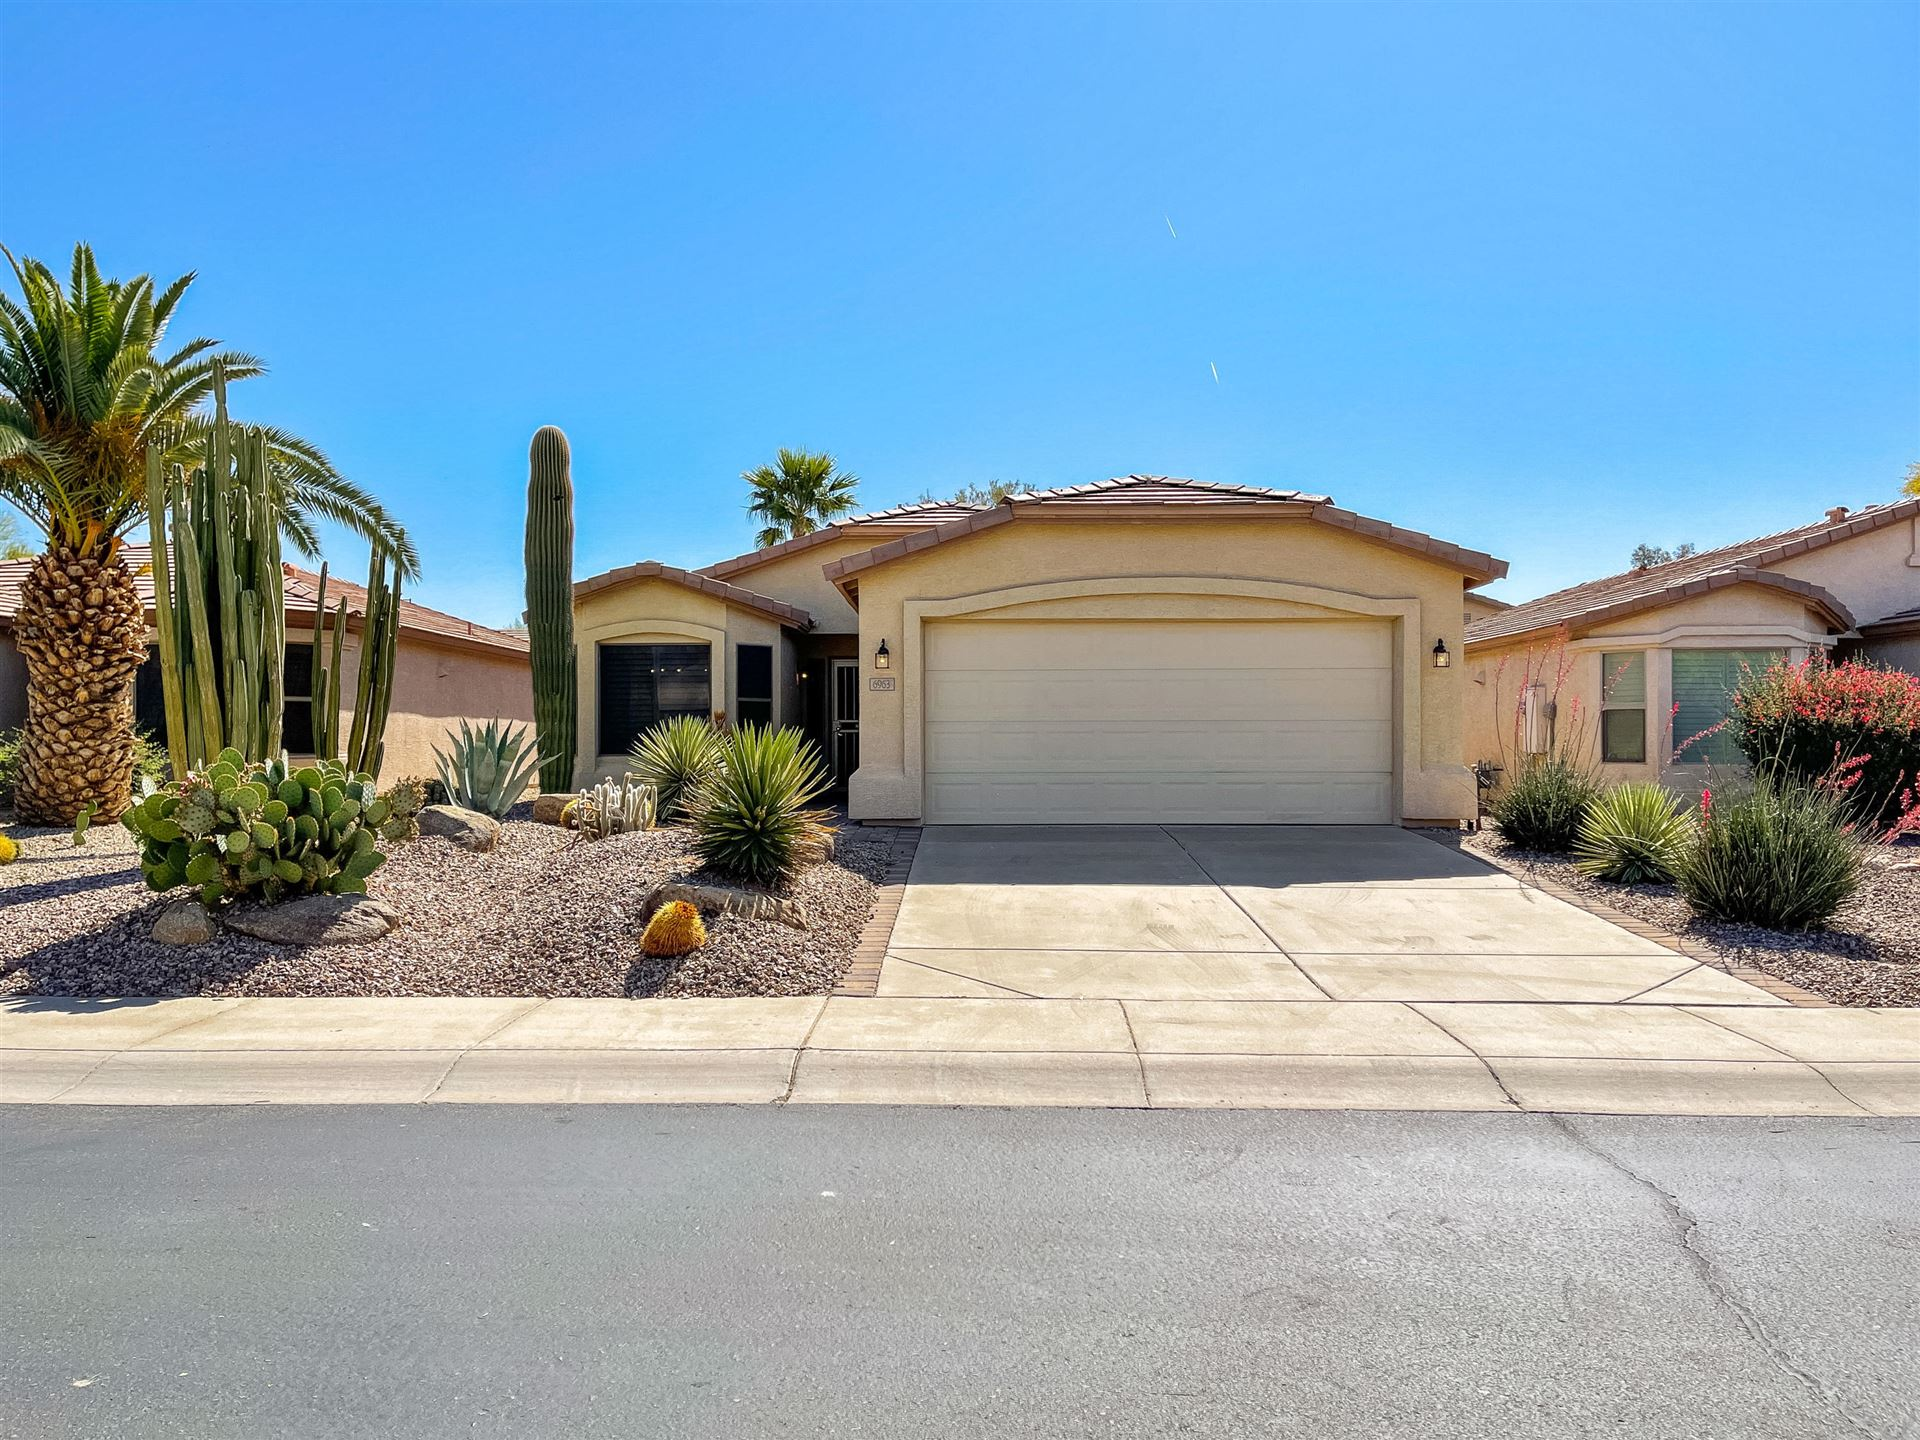 Photo of 6963 S SANTA RITA Way, Chandler, AZ 85249 (MLS # 6234471)